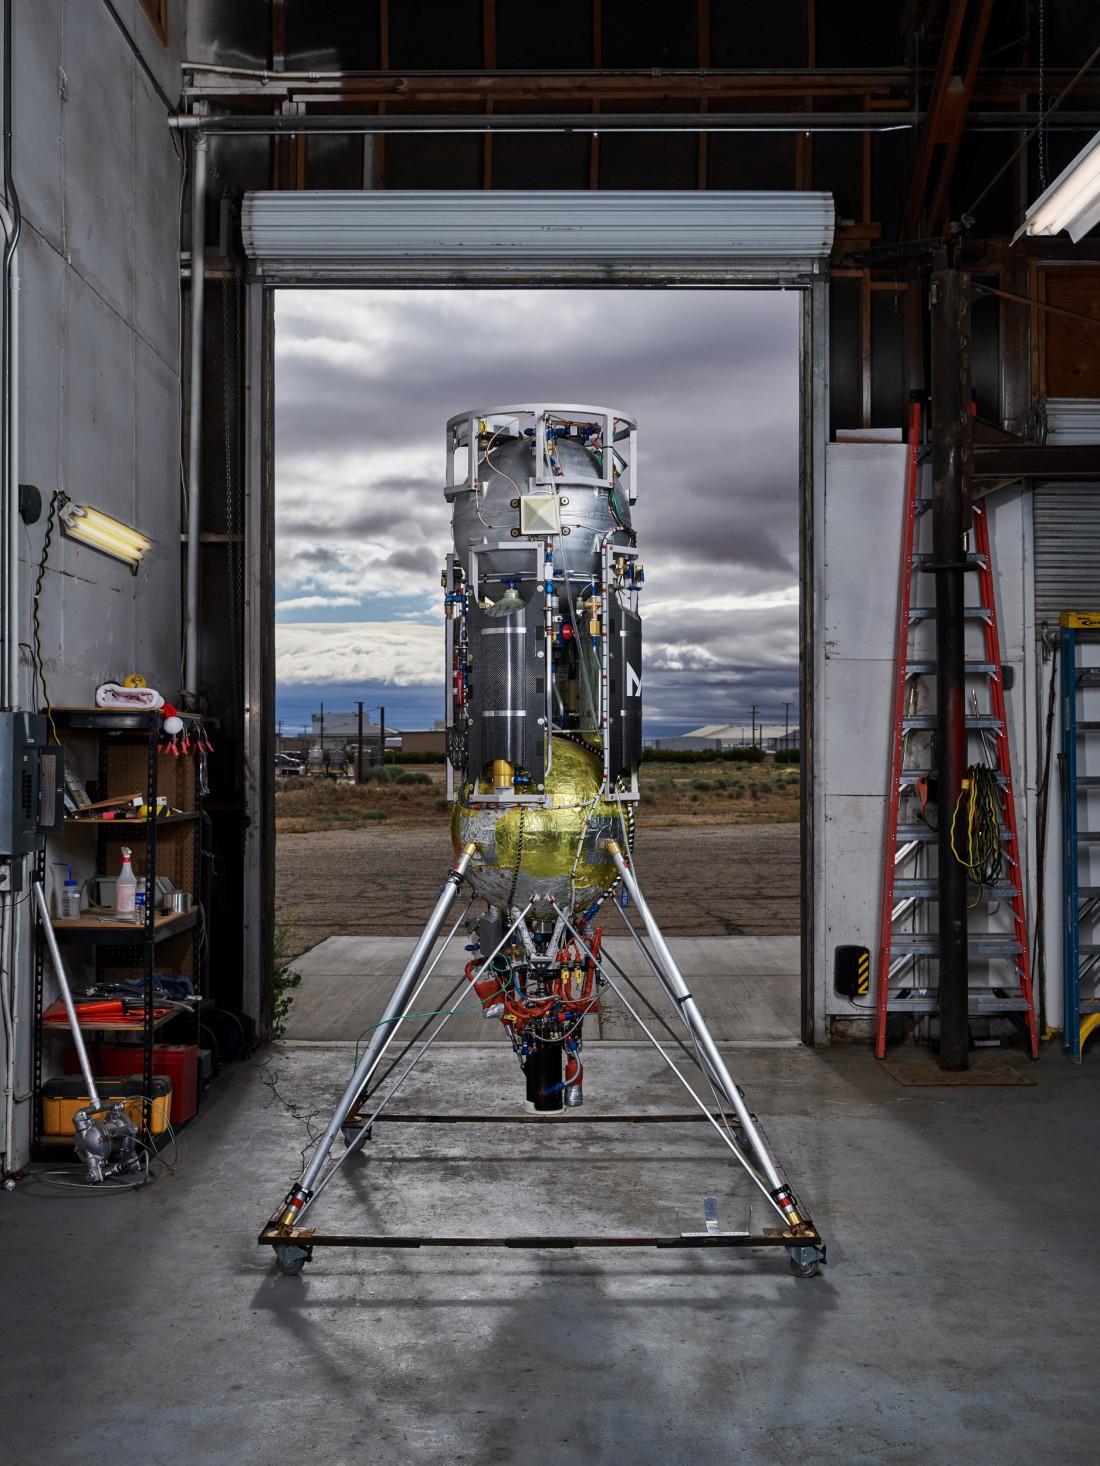 The world's smallest big rocket company